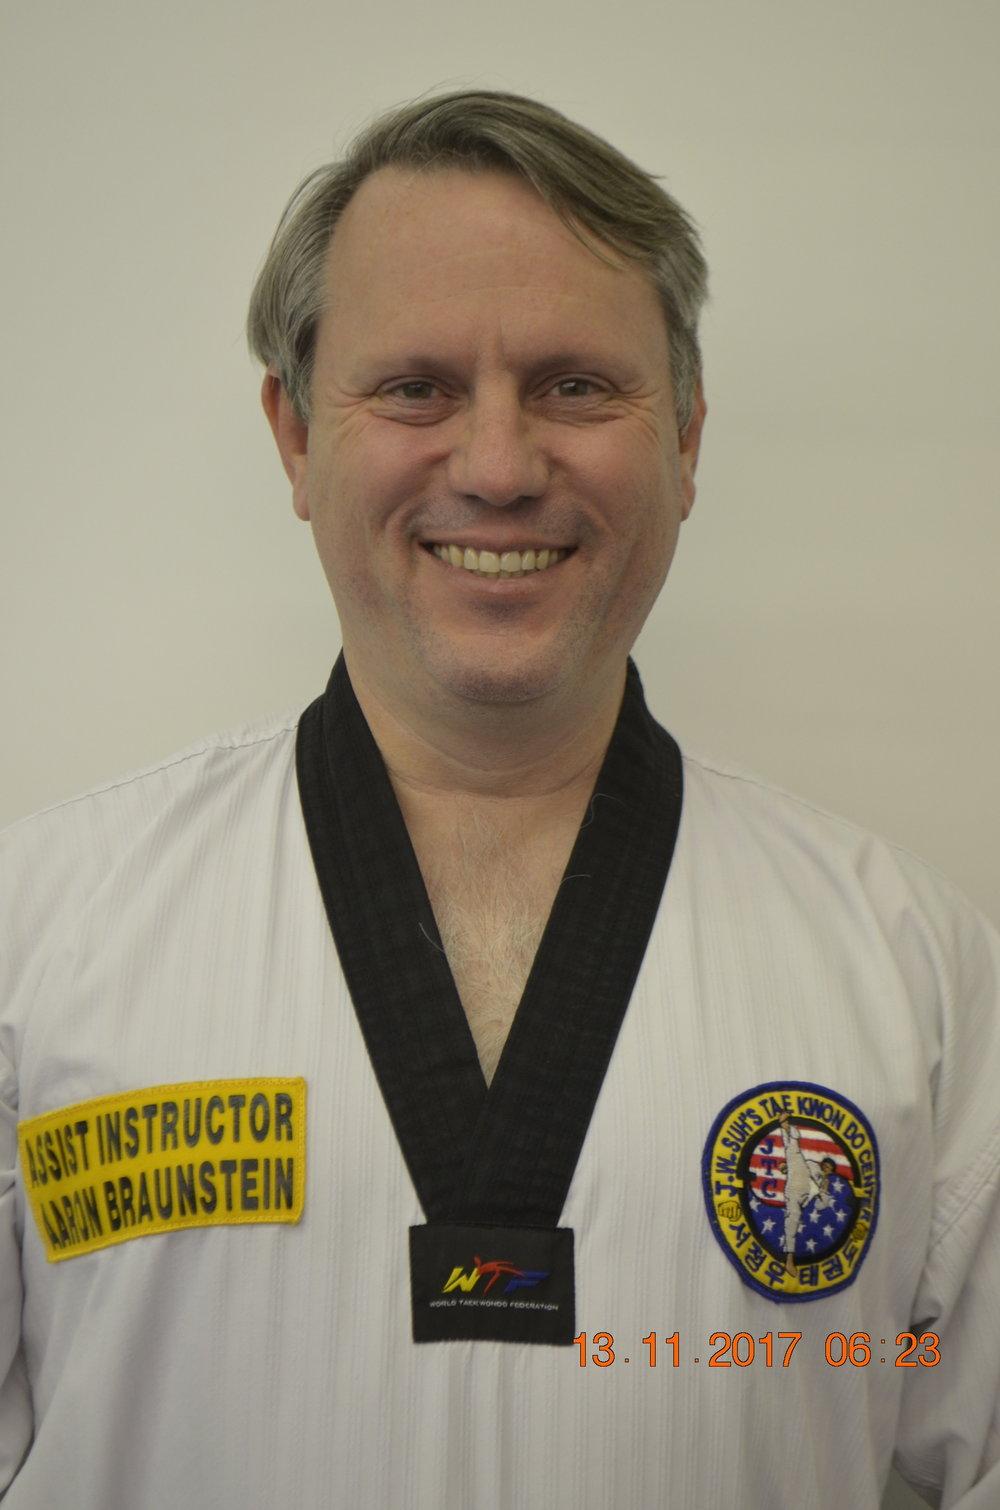 Aaron Braunstein.JPG